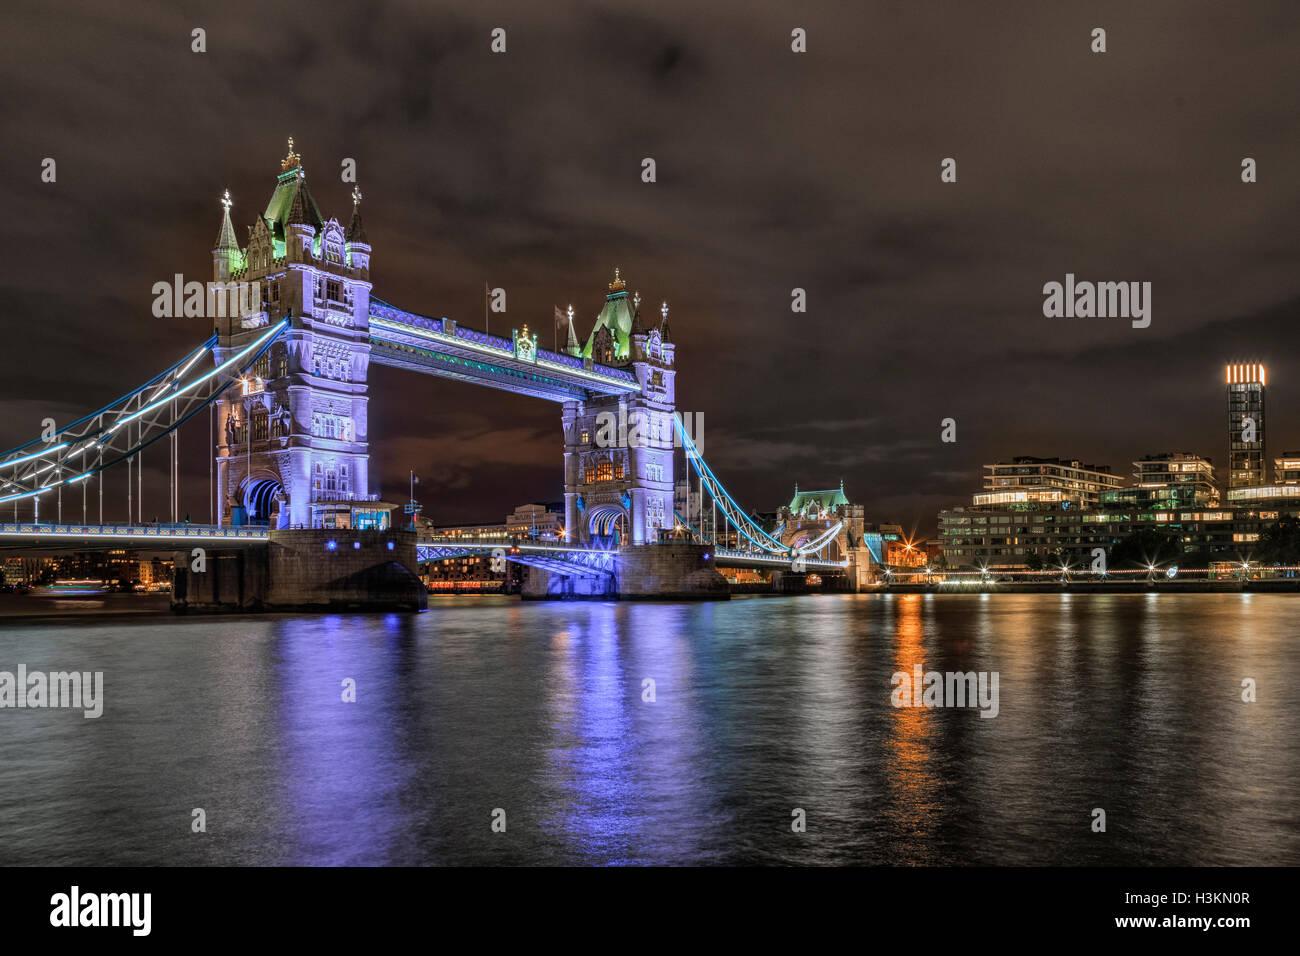 Tower Bridge, London, England, UK Stock Photo